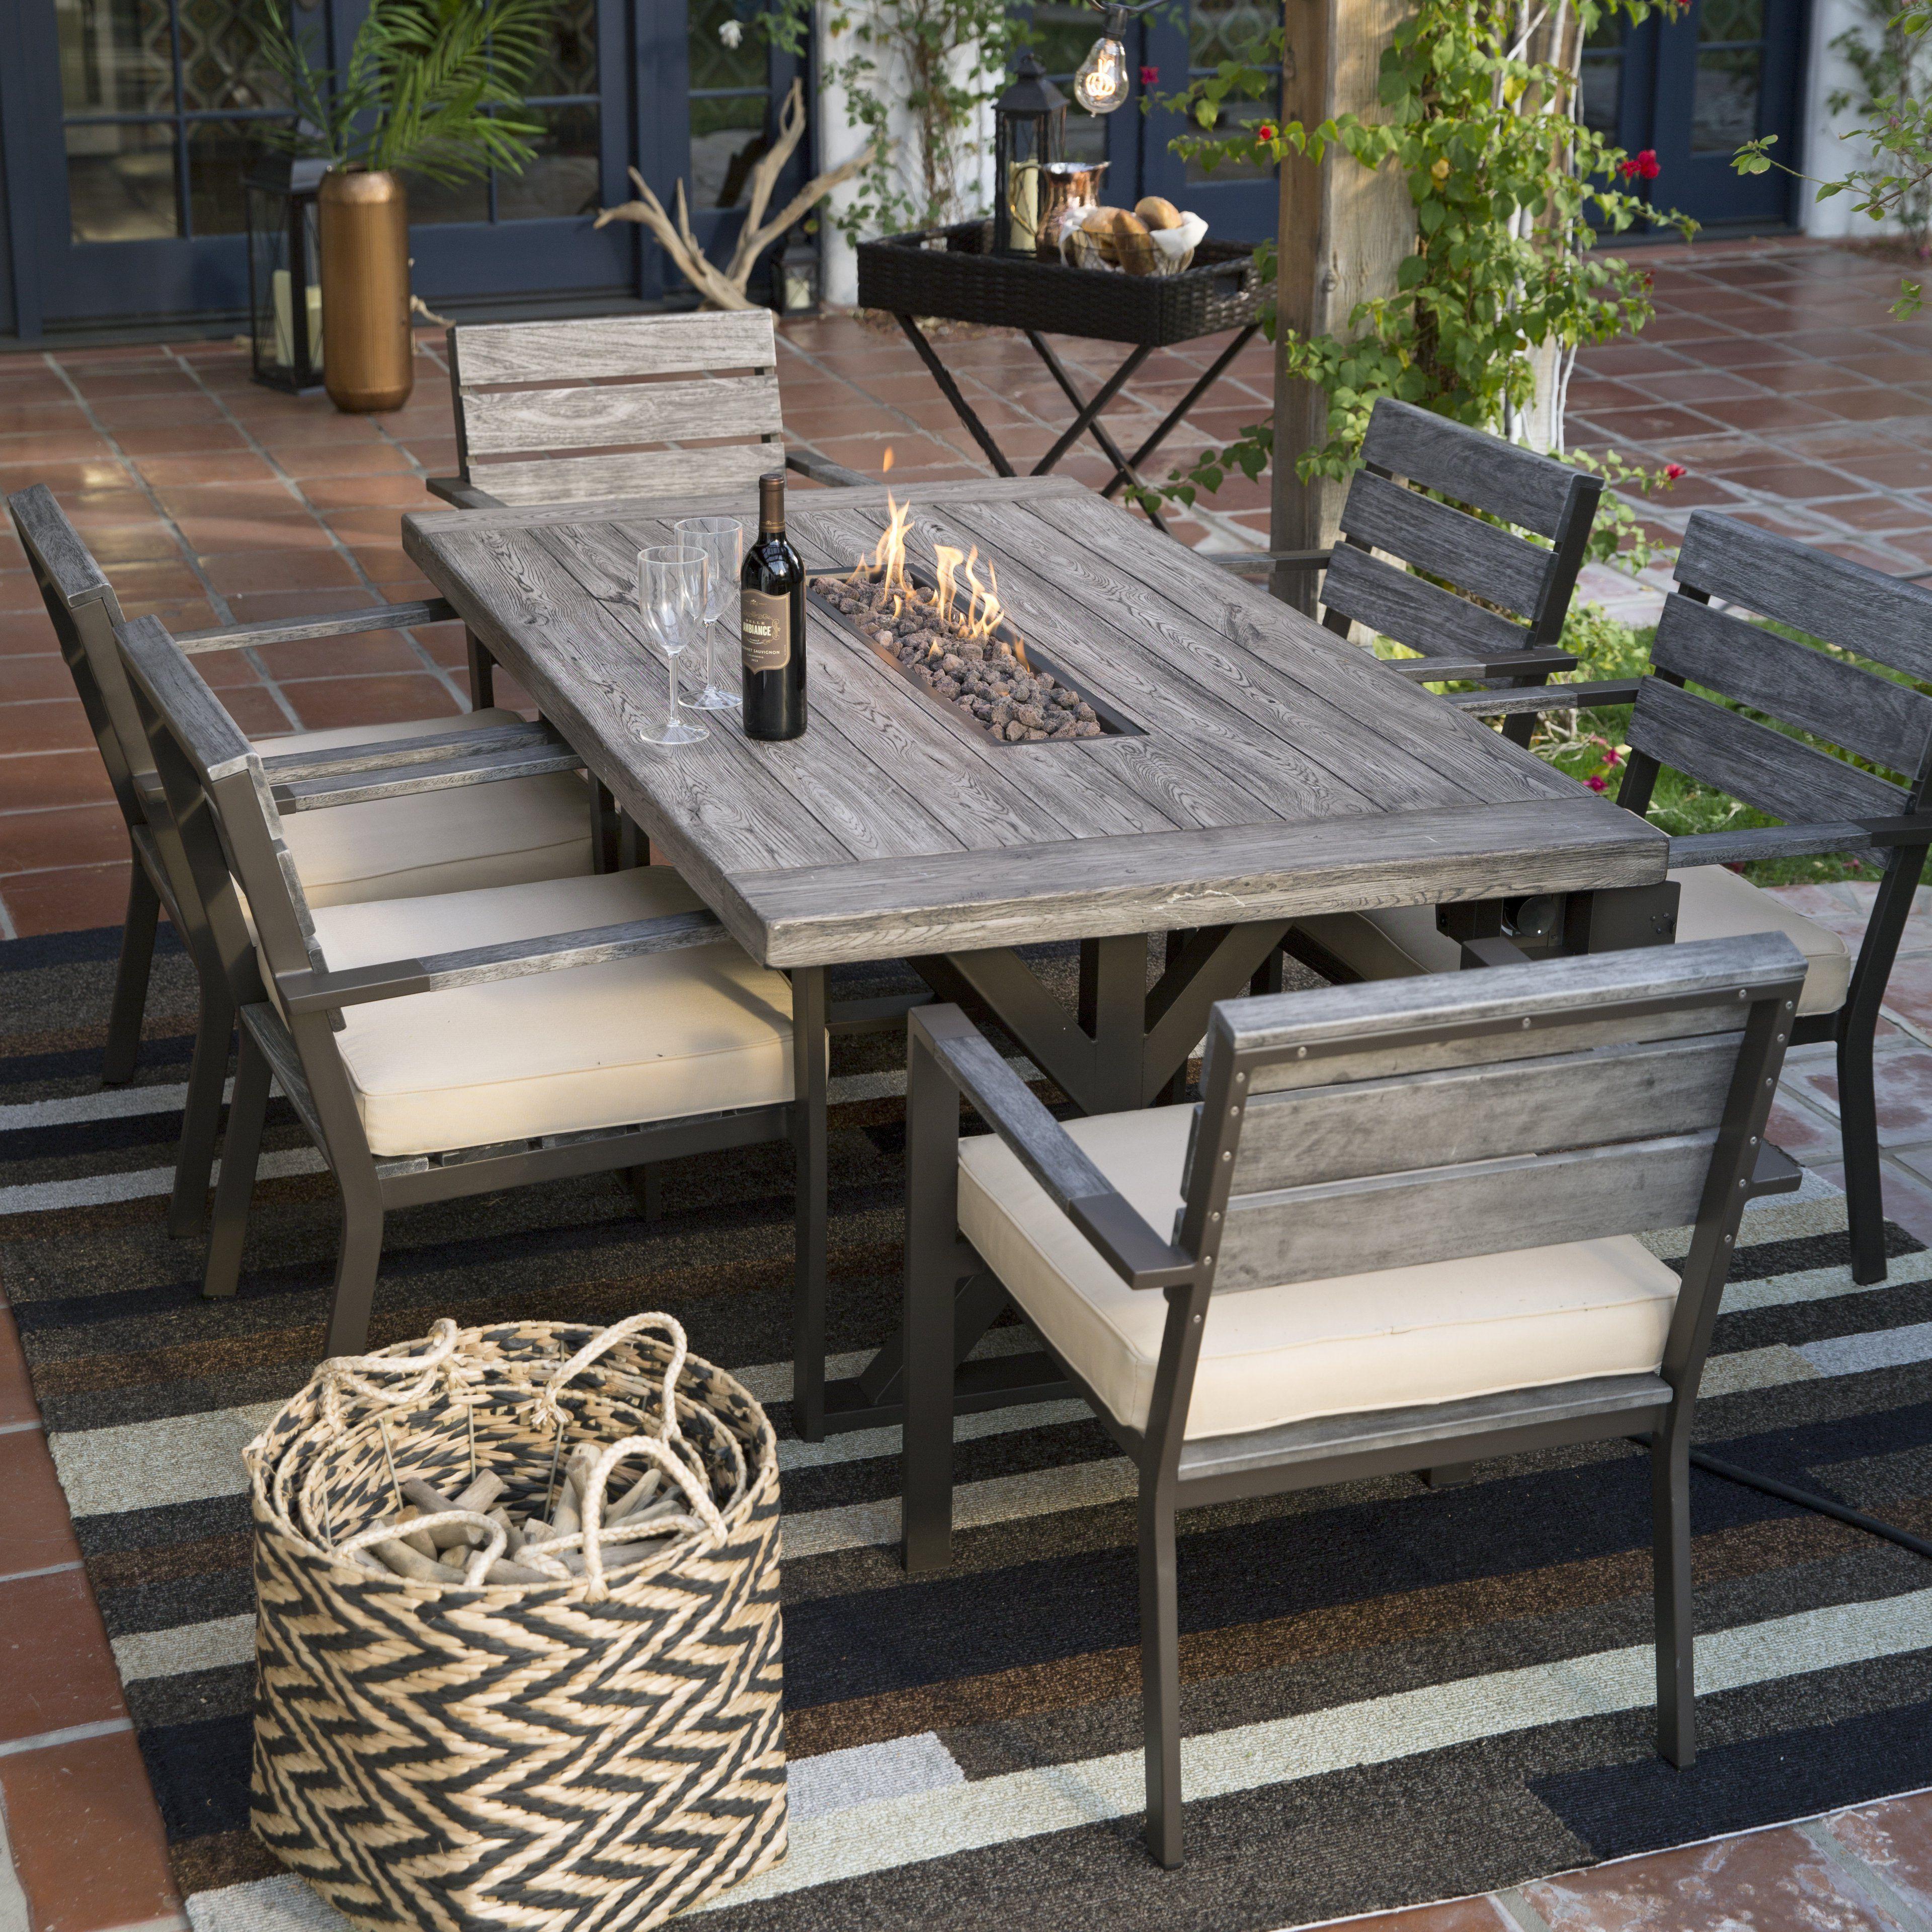 Best 25+ Fire Pit Table Ideas On Pinterest | Diy Grill, Fire Pit Grill And Outdoor  Fire Pit Table